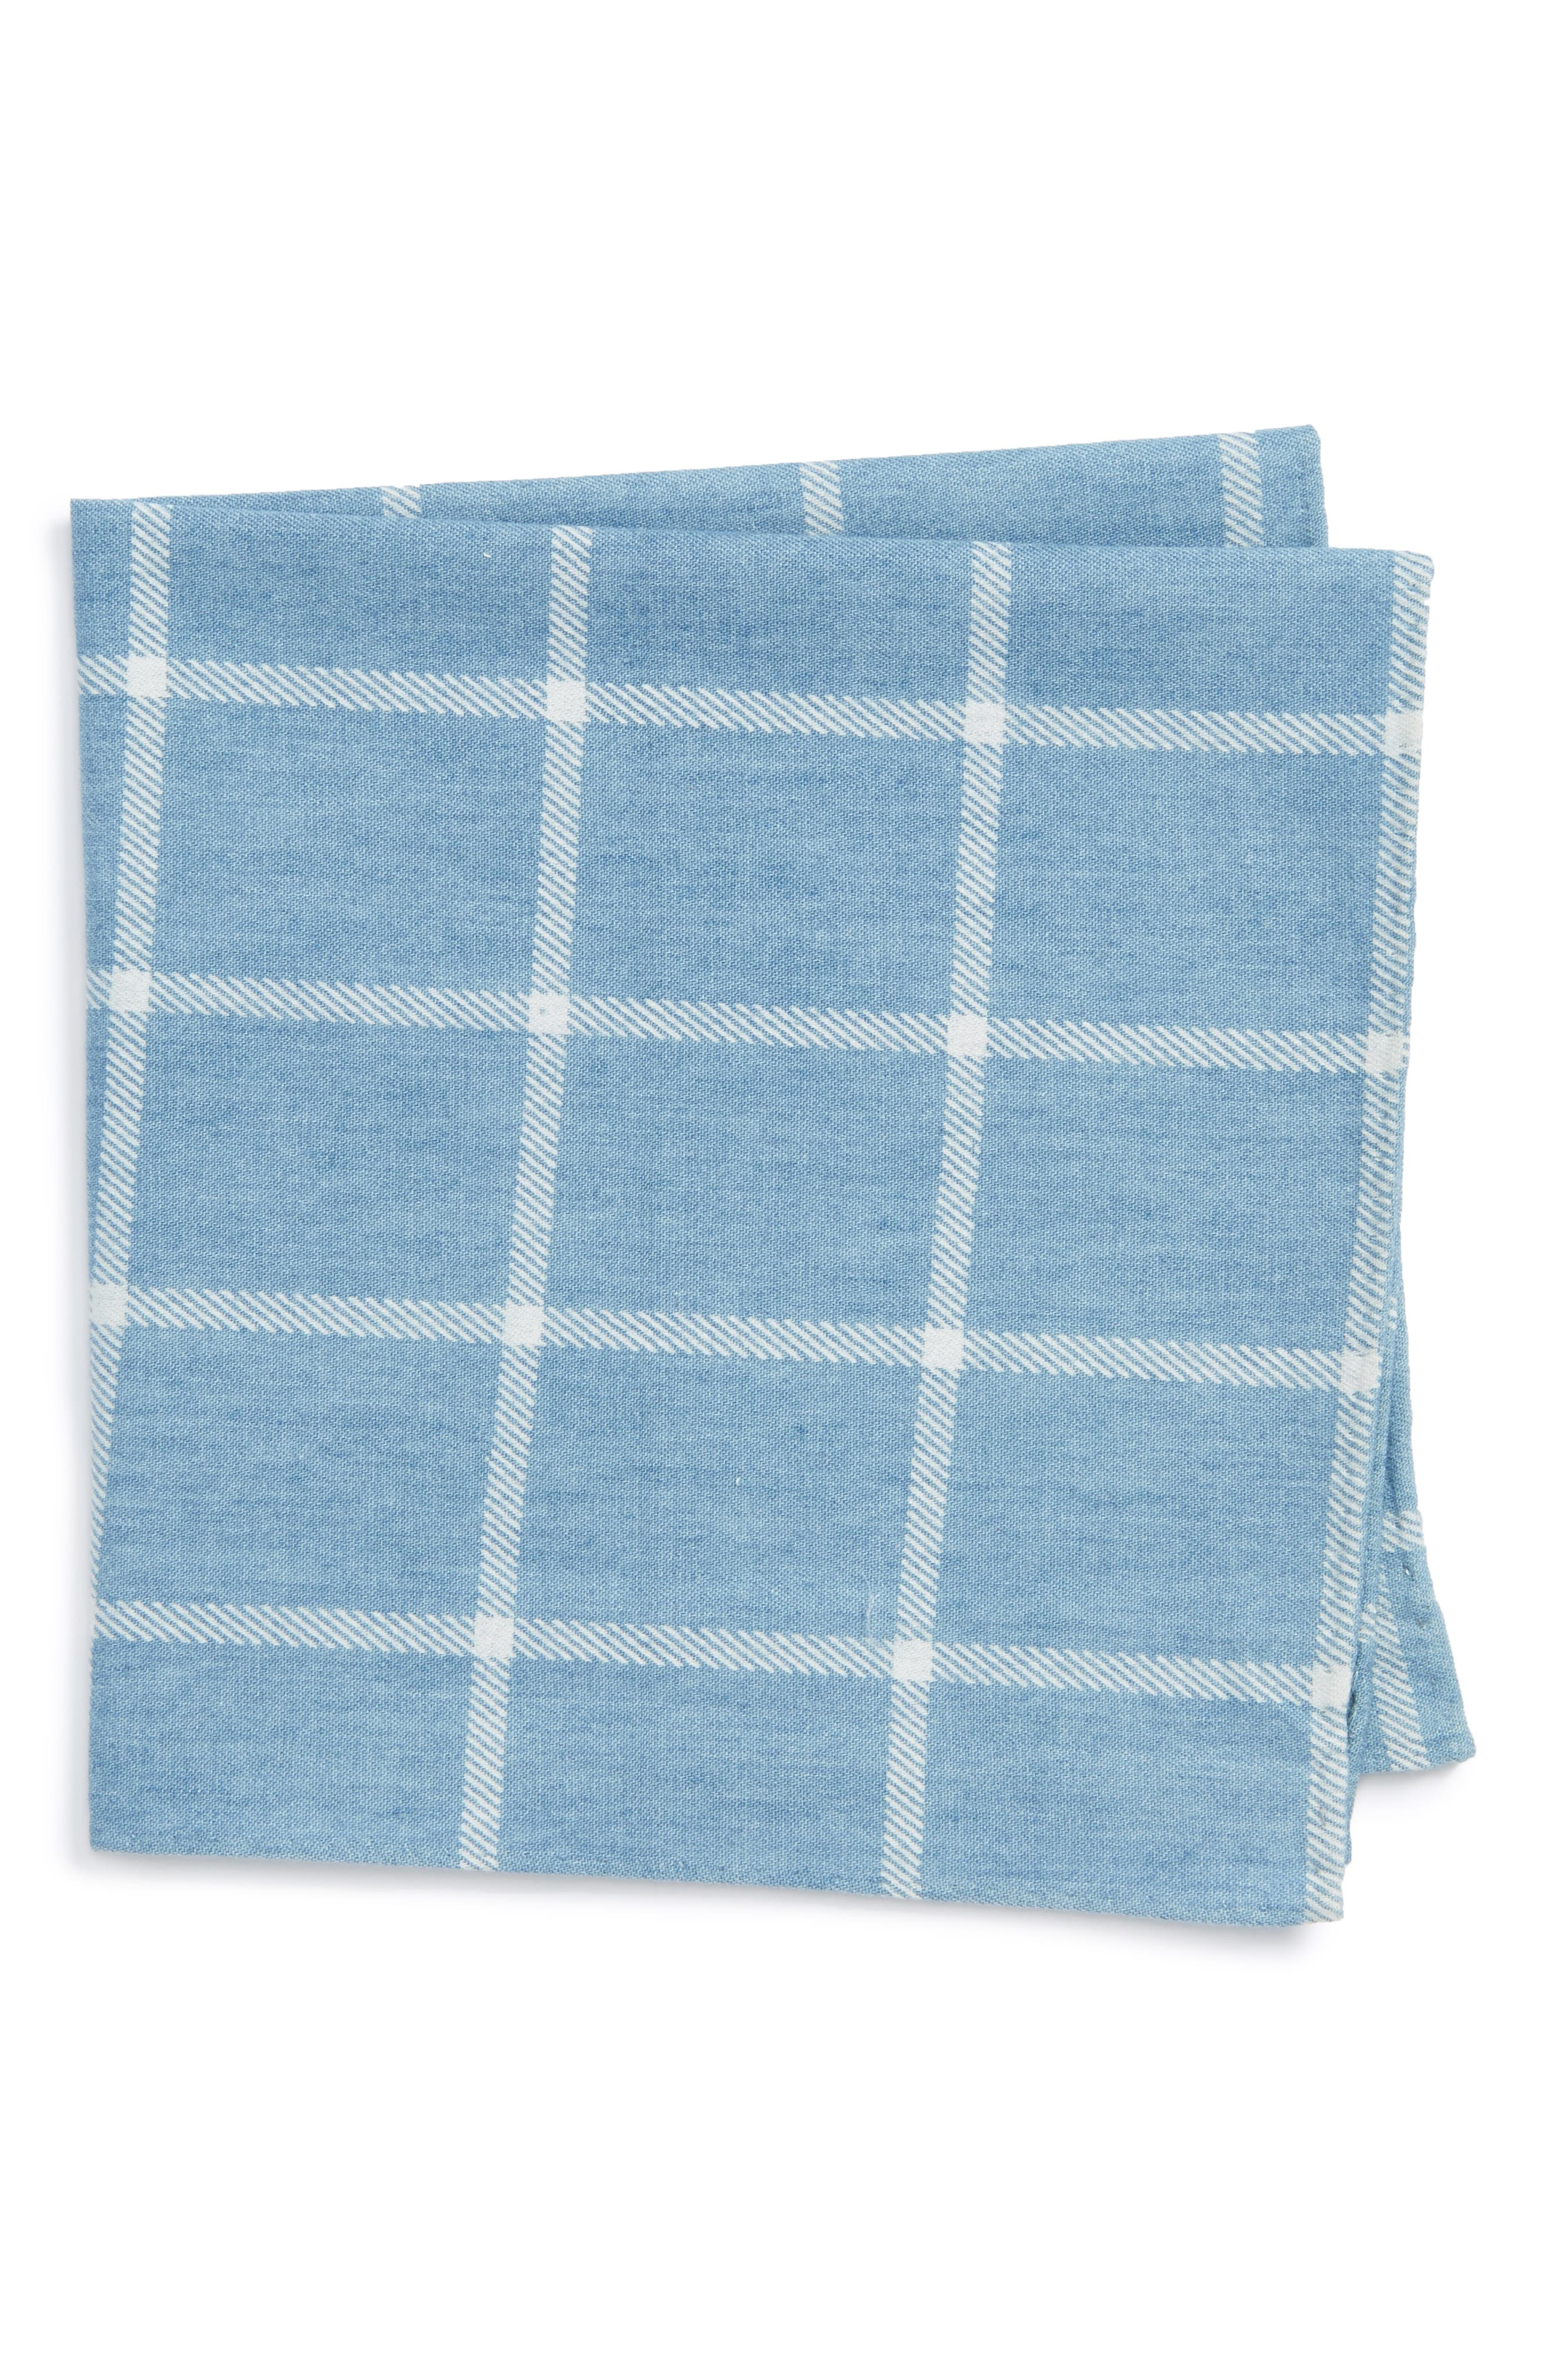 Nordstrom Men's Shop Sergi Check Cotton Pocket Square